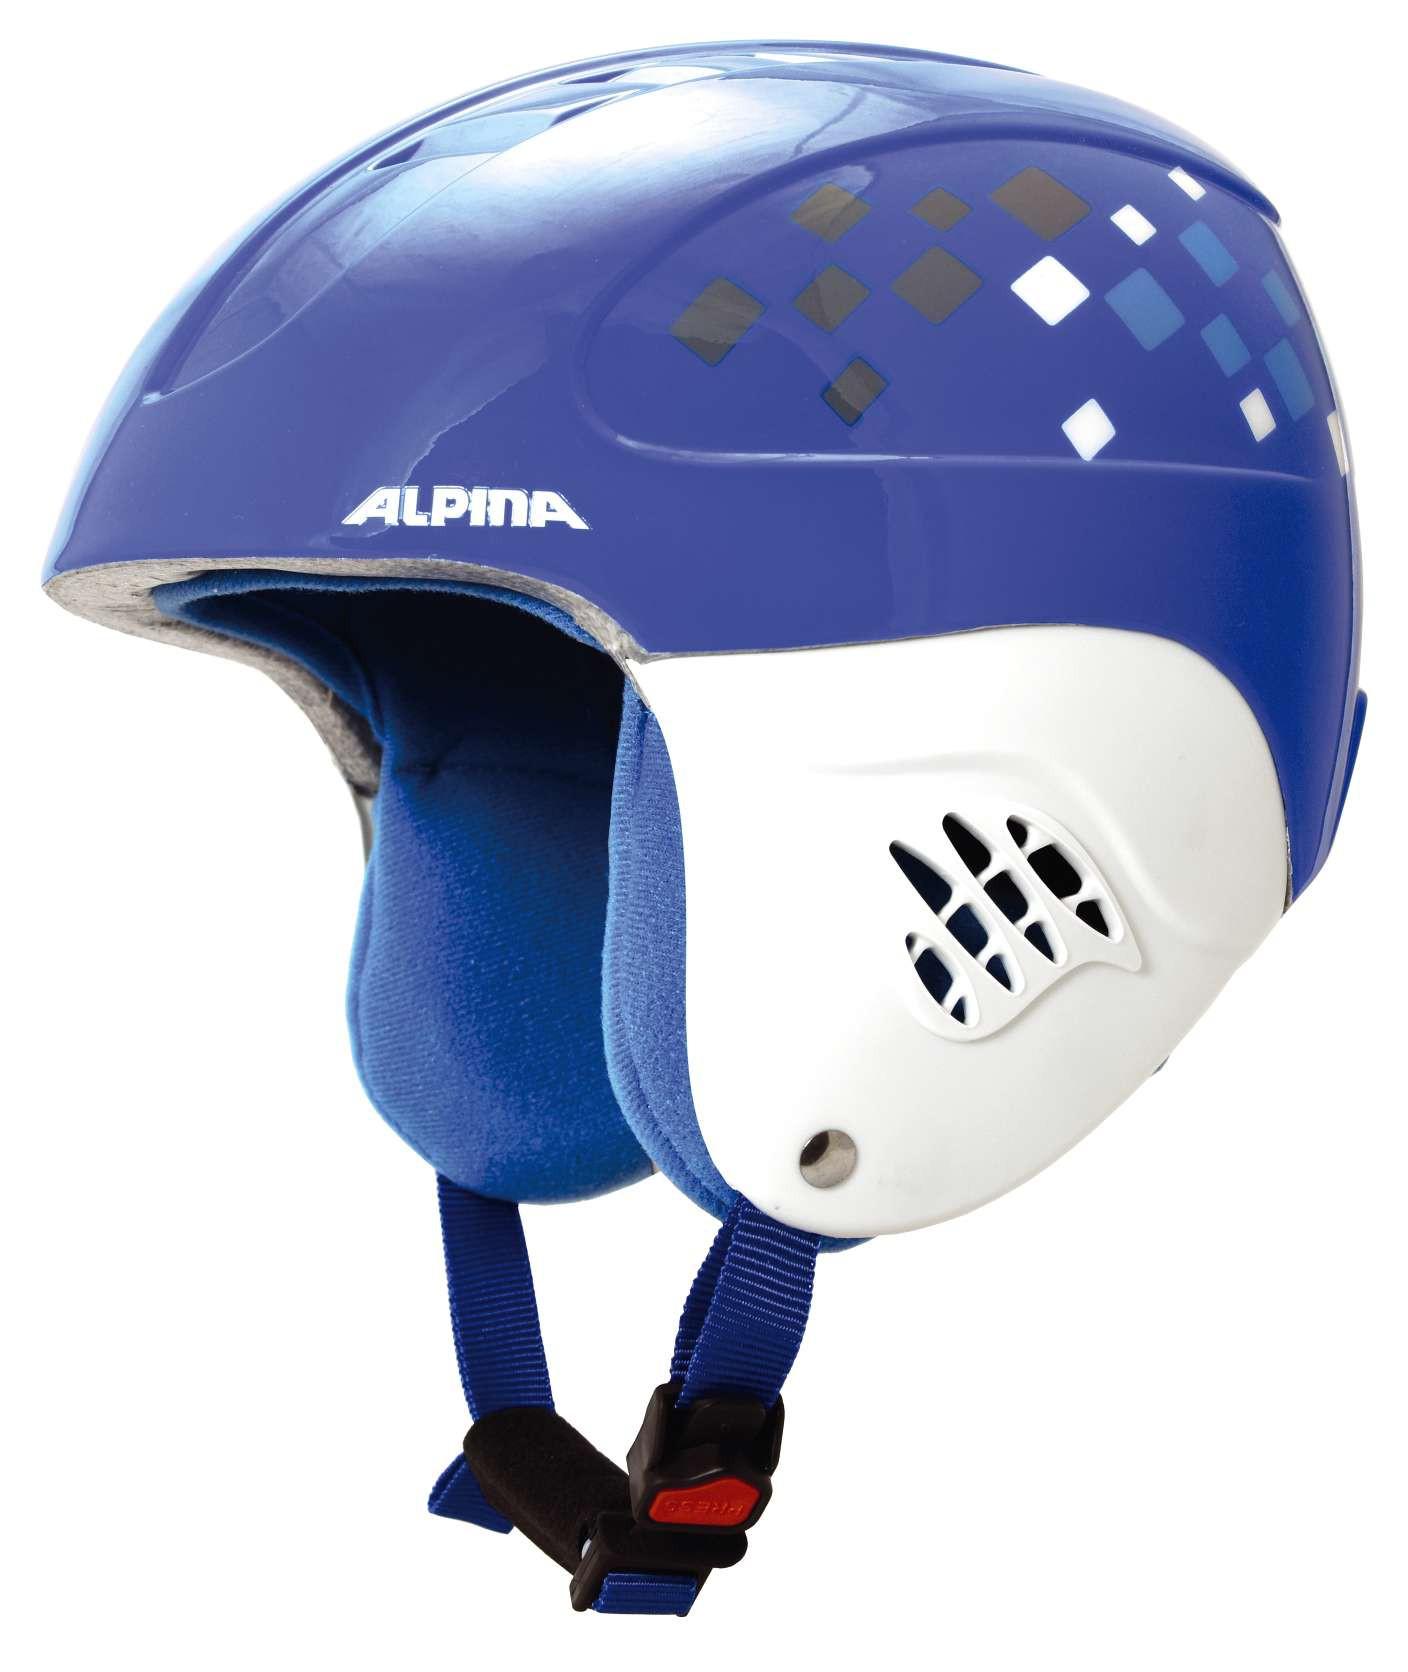 CARAT A A9035 2016 Kinderskihelm Alpina CARA